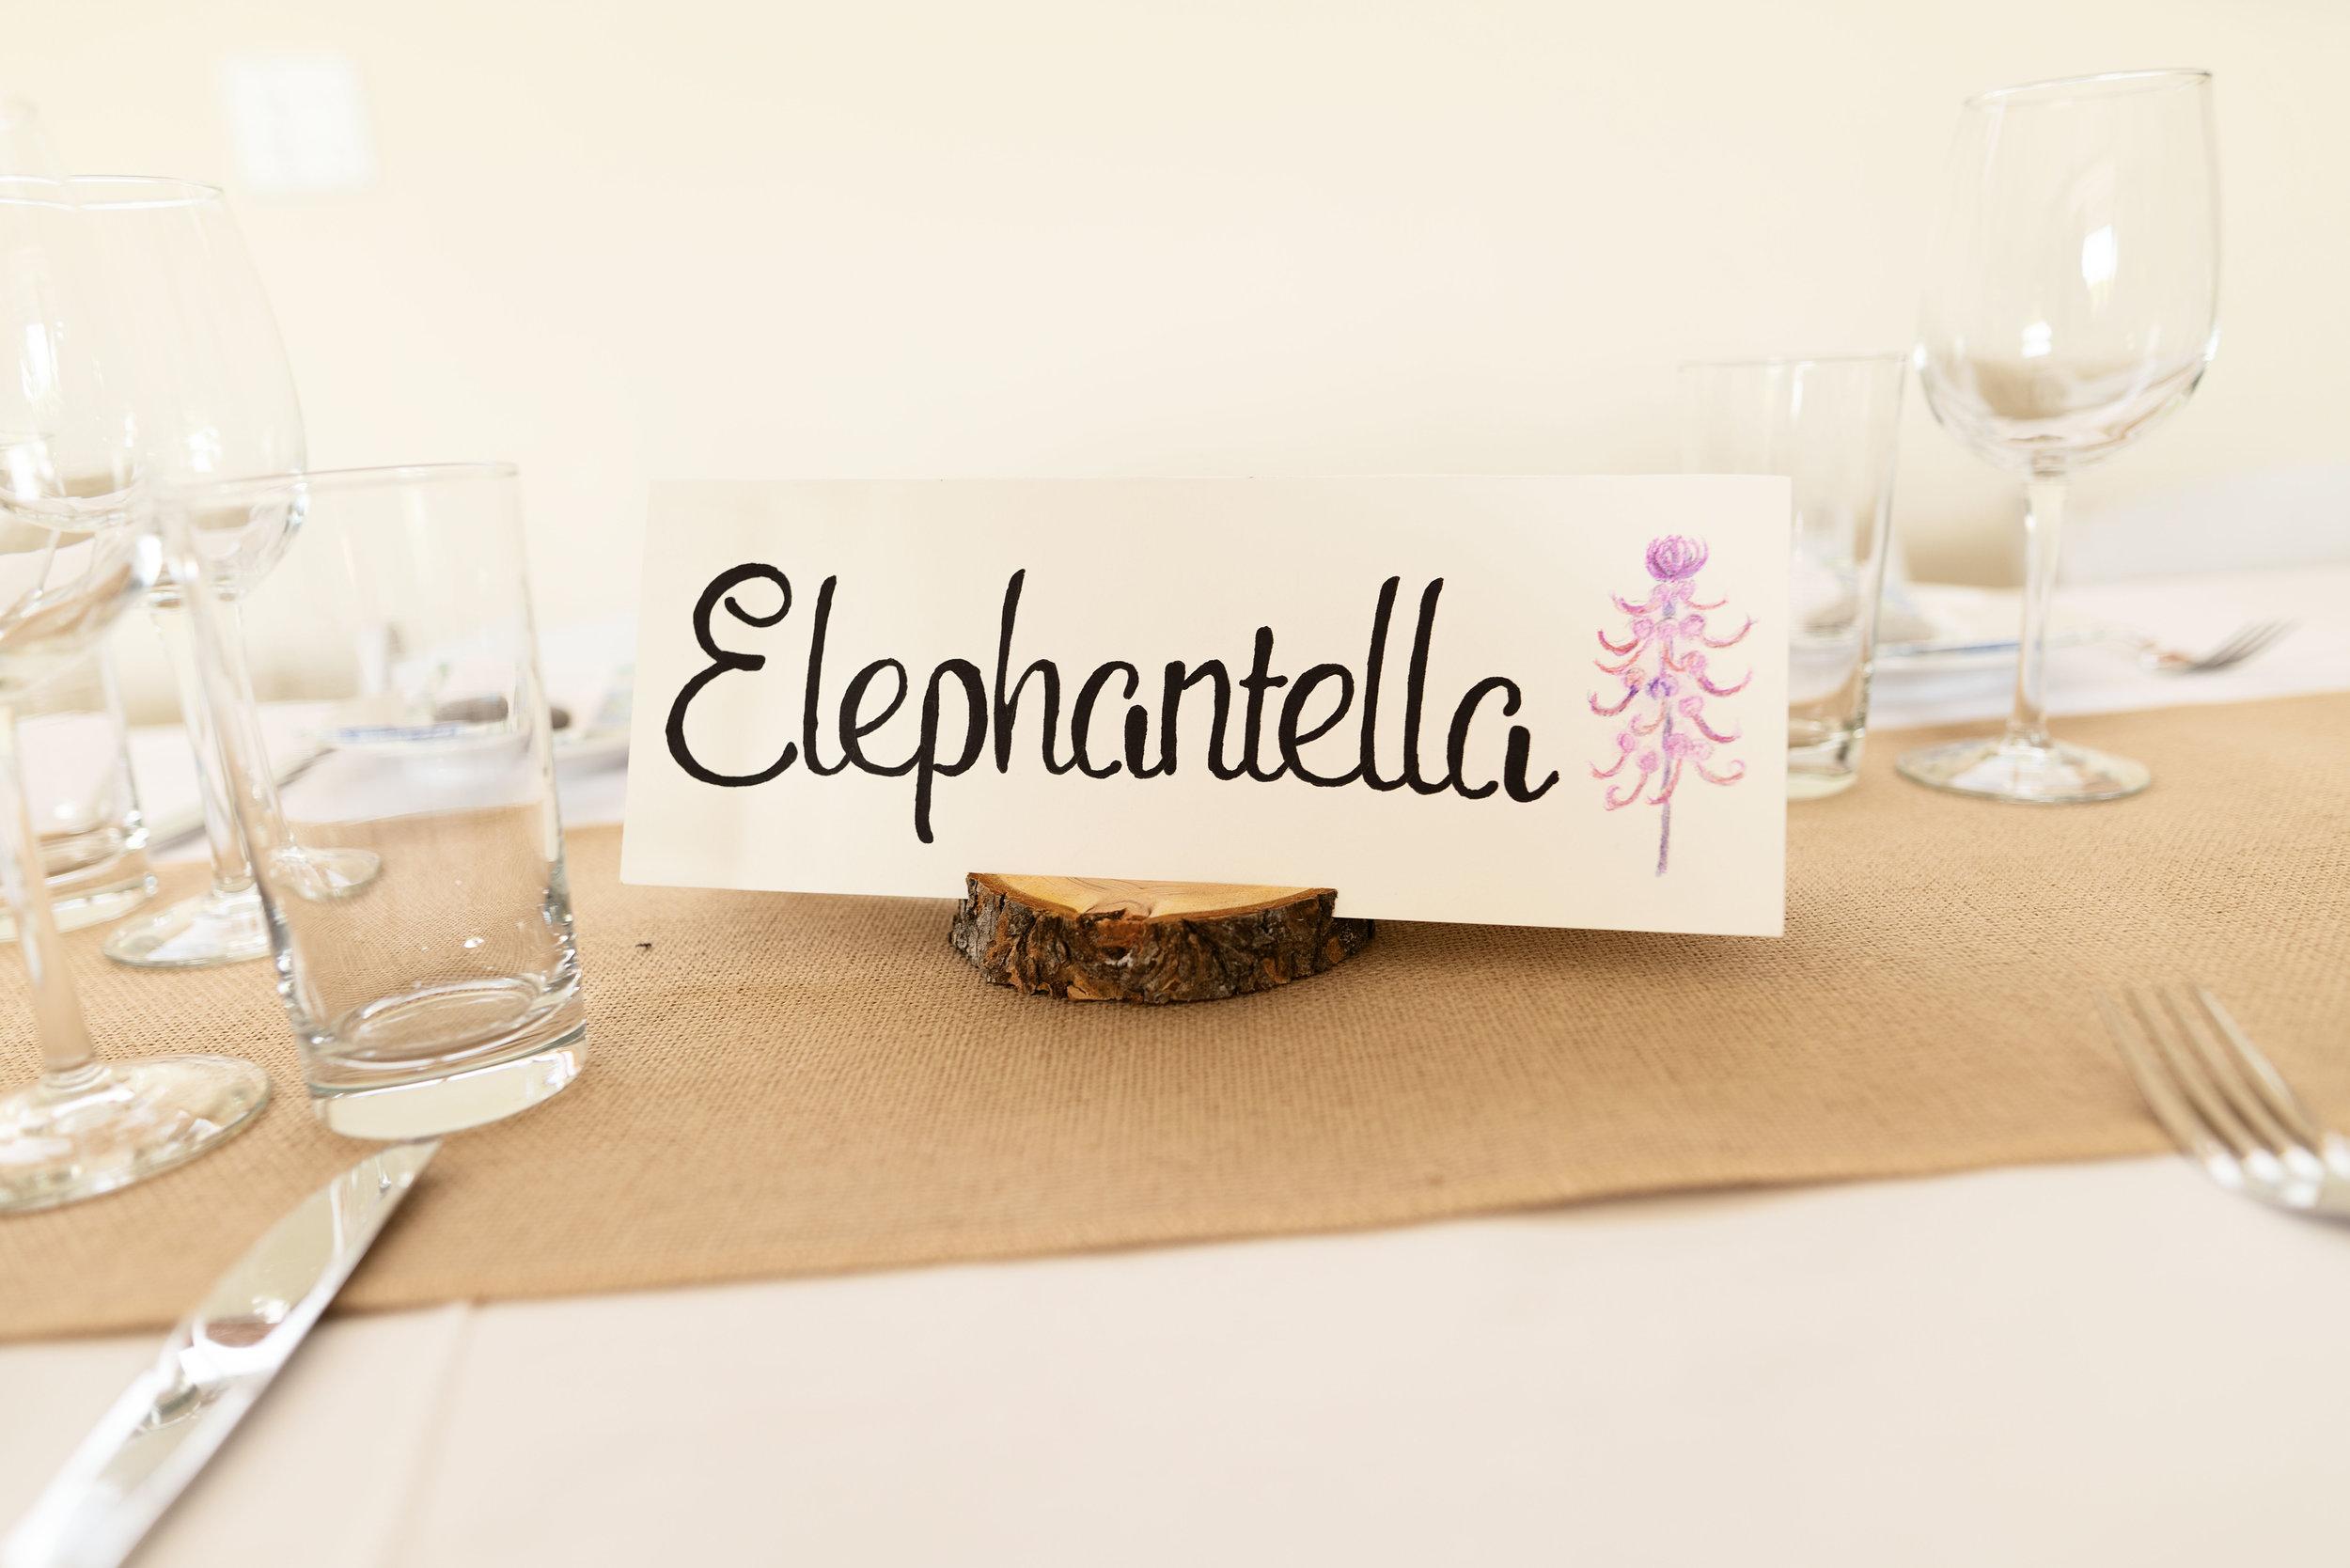 elephantella.jpg